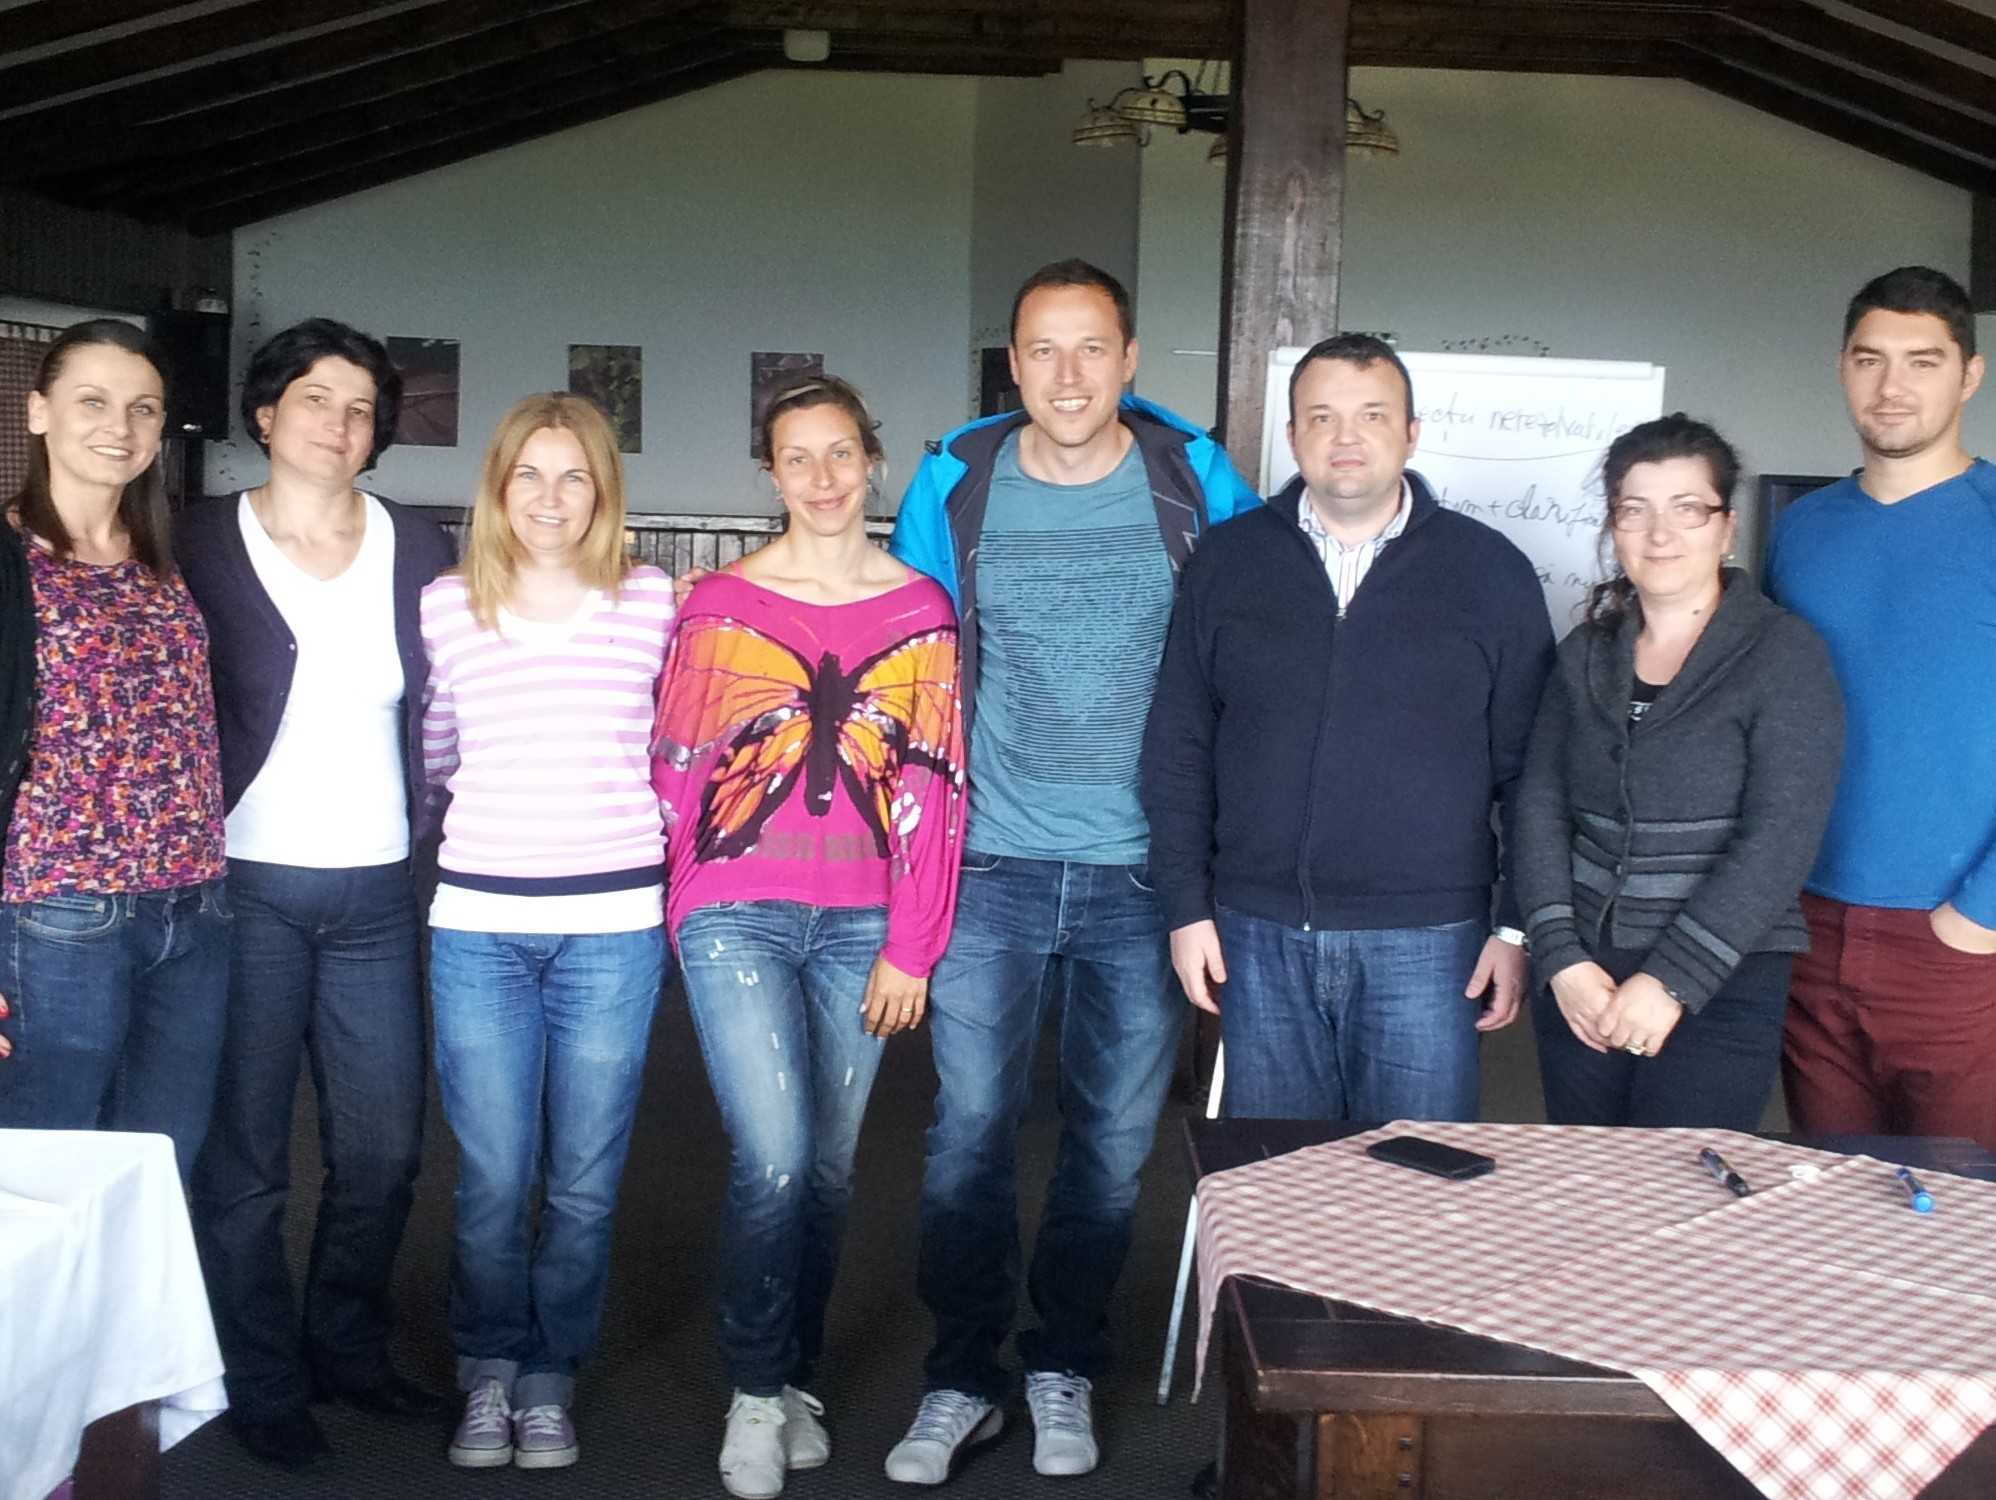 Impreuna cu echipa Urban-Invest SA - Brasov